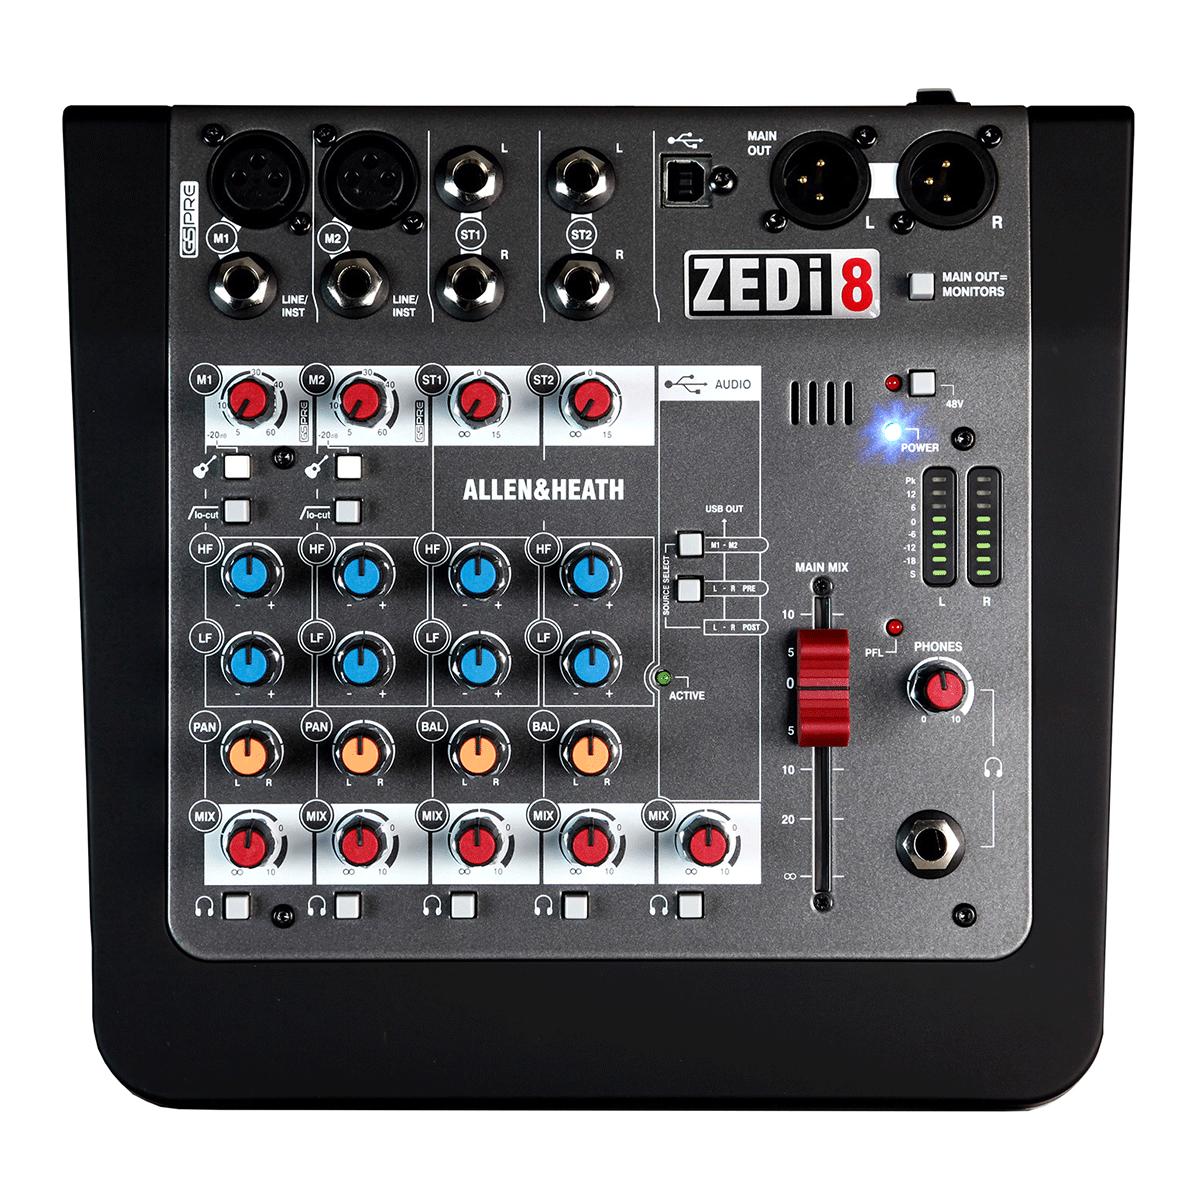 Billede af Allen&Heath ZEDi-8 mixer